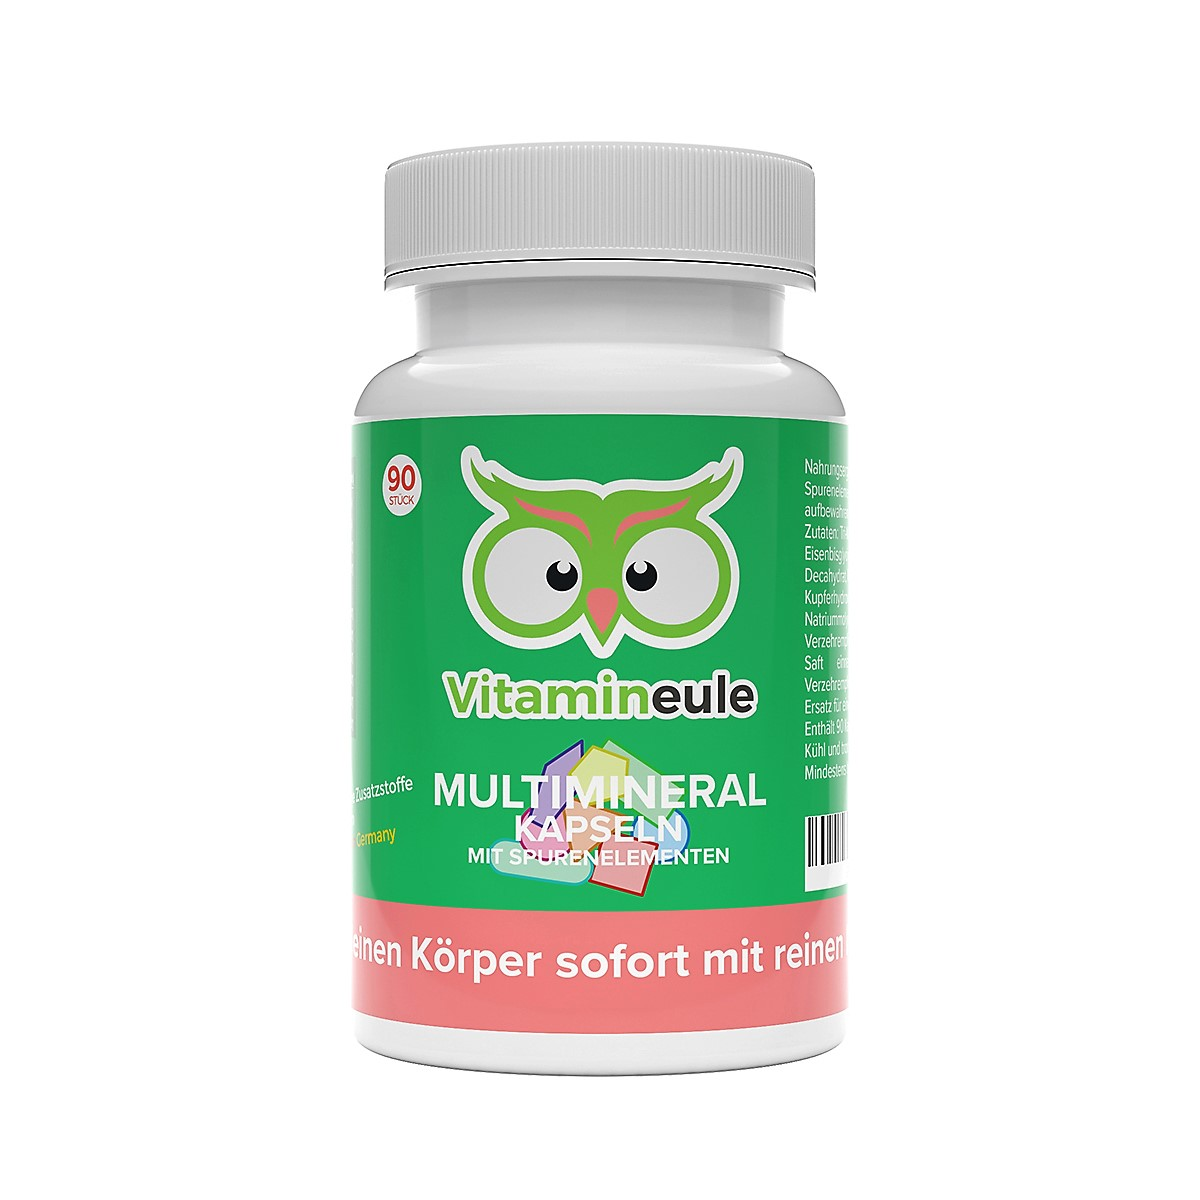 Multimineral Kapseln von Vitamineule